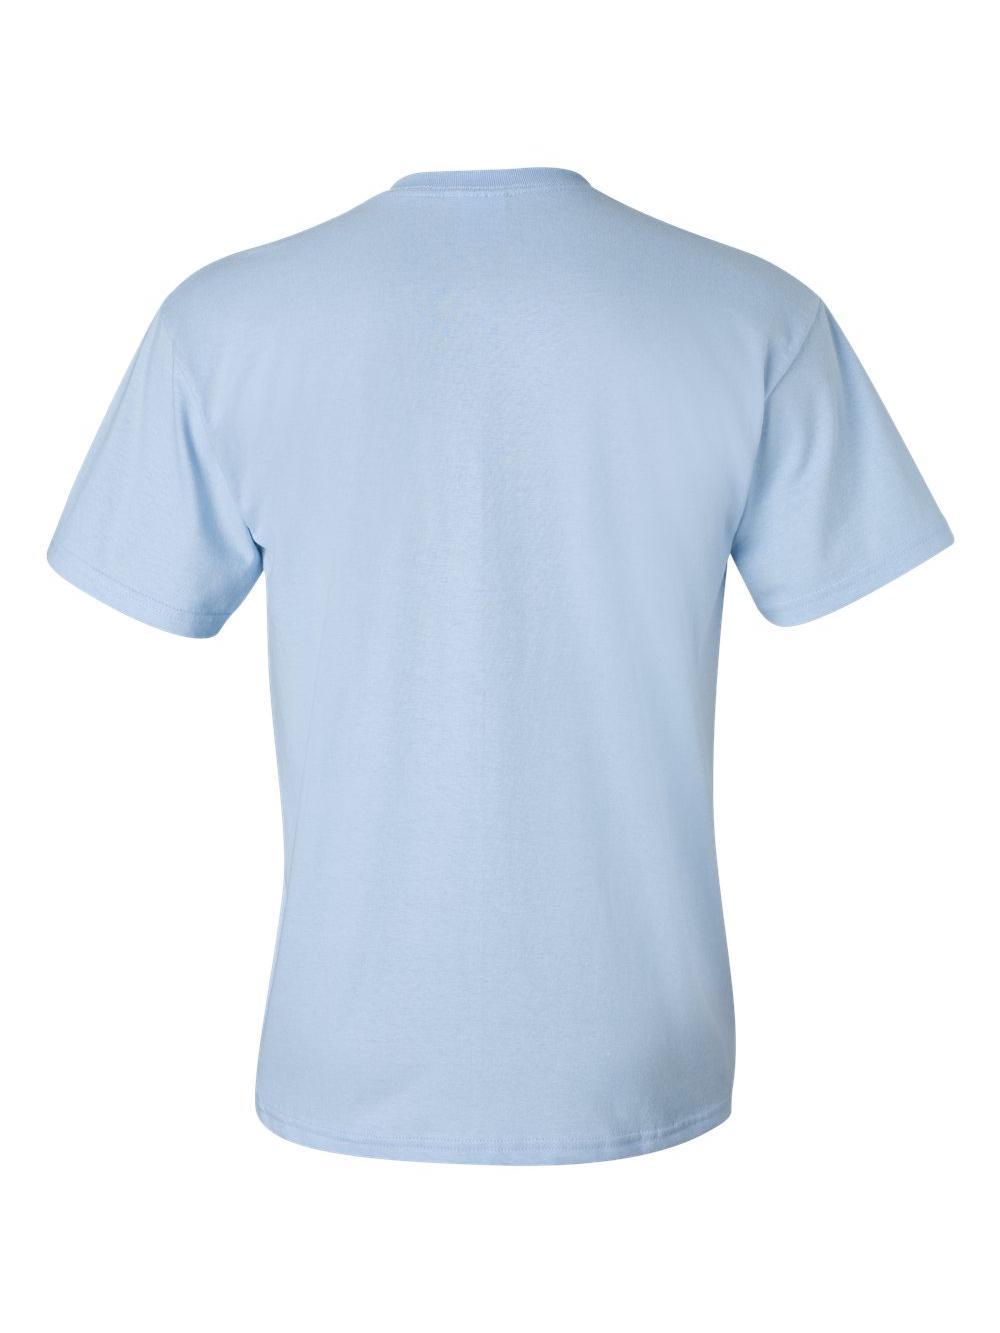 Gildan-Ultra-Cotton-T-Shirt-with-a-Pocket-2300 thumbnail 16